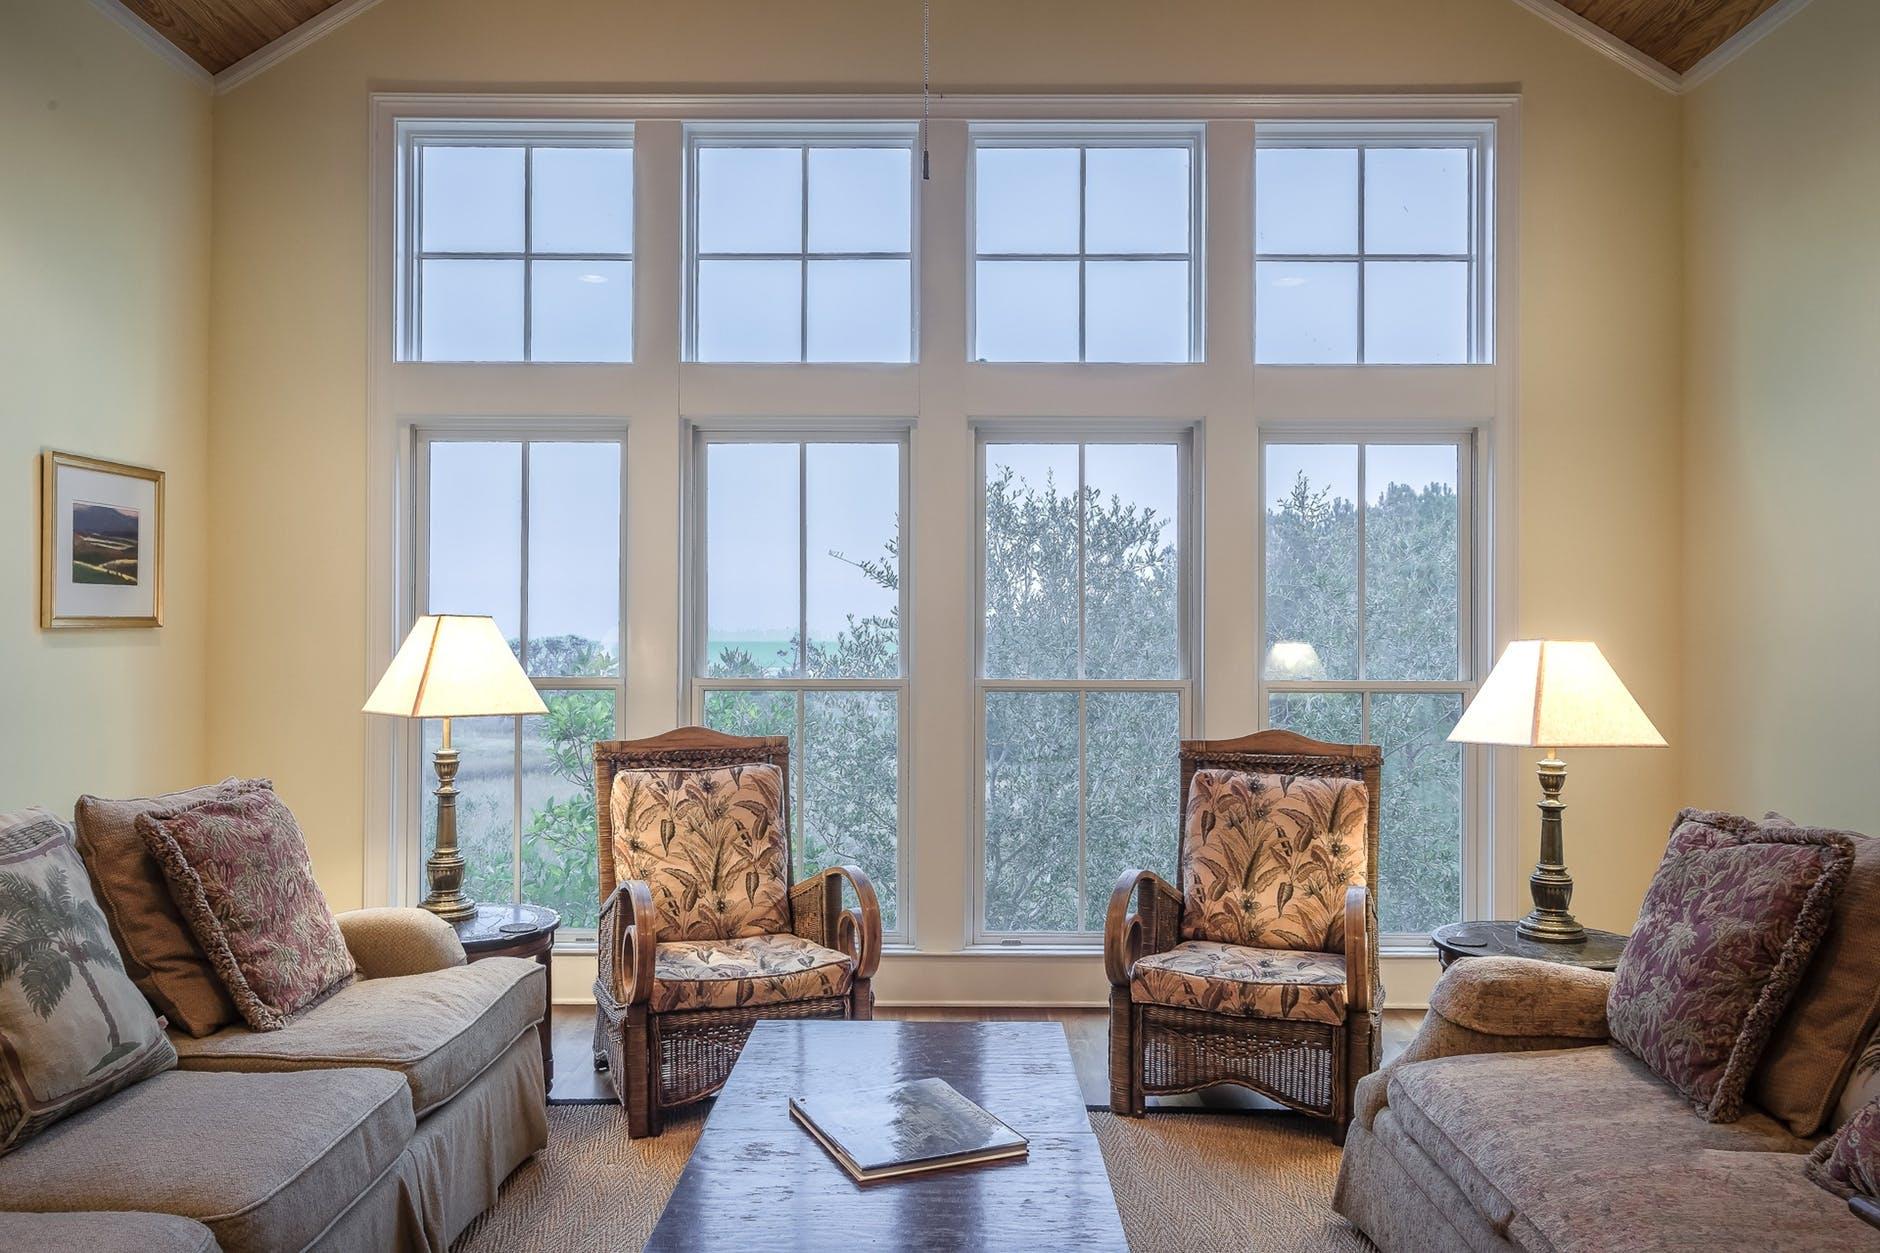 Markham Windows and Doors